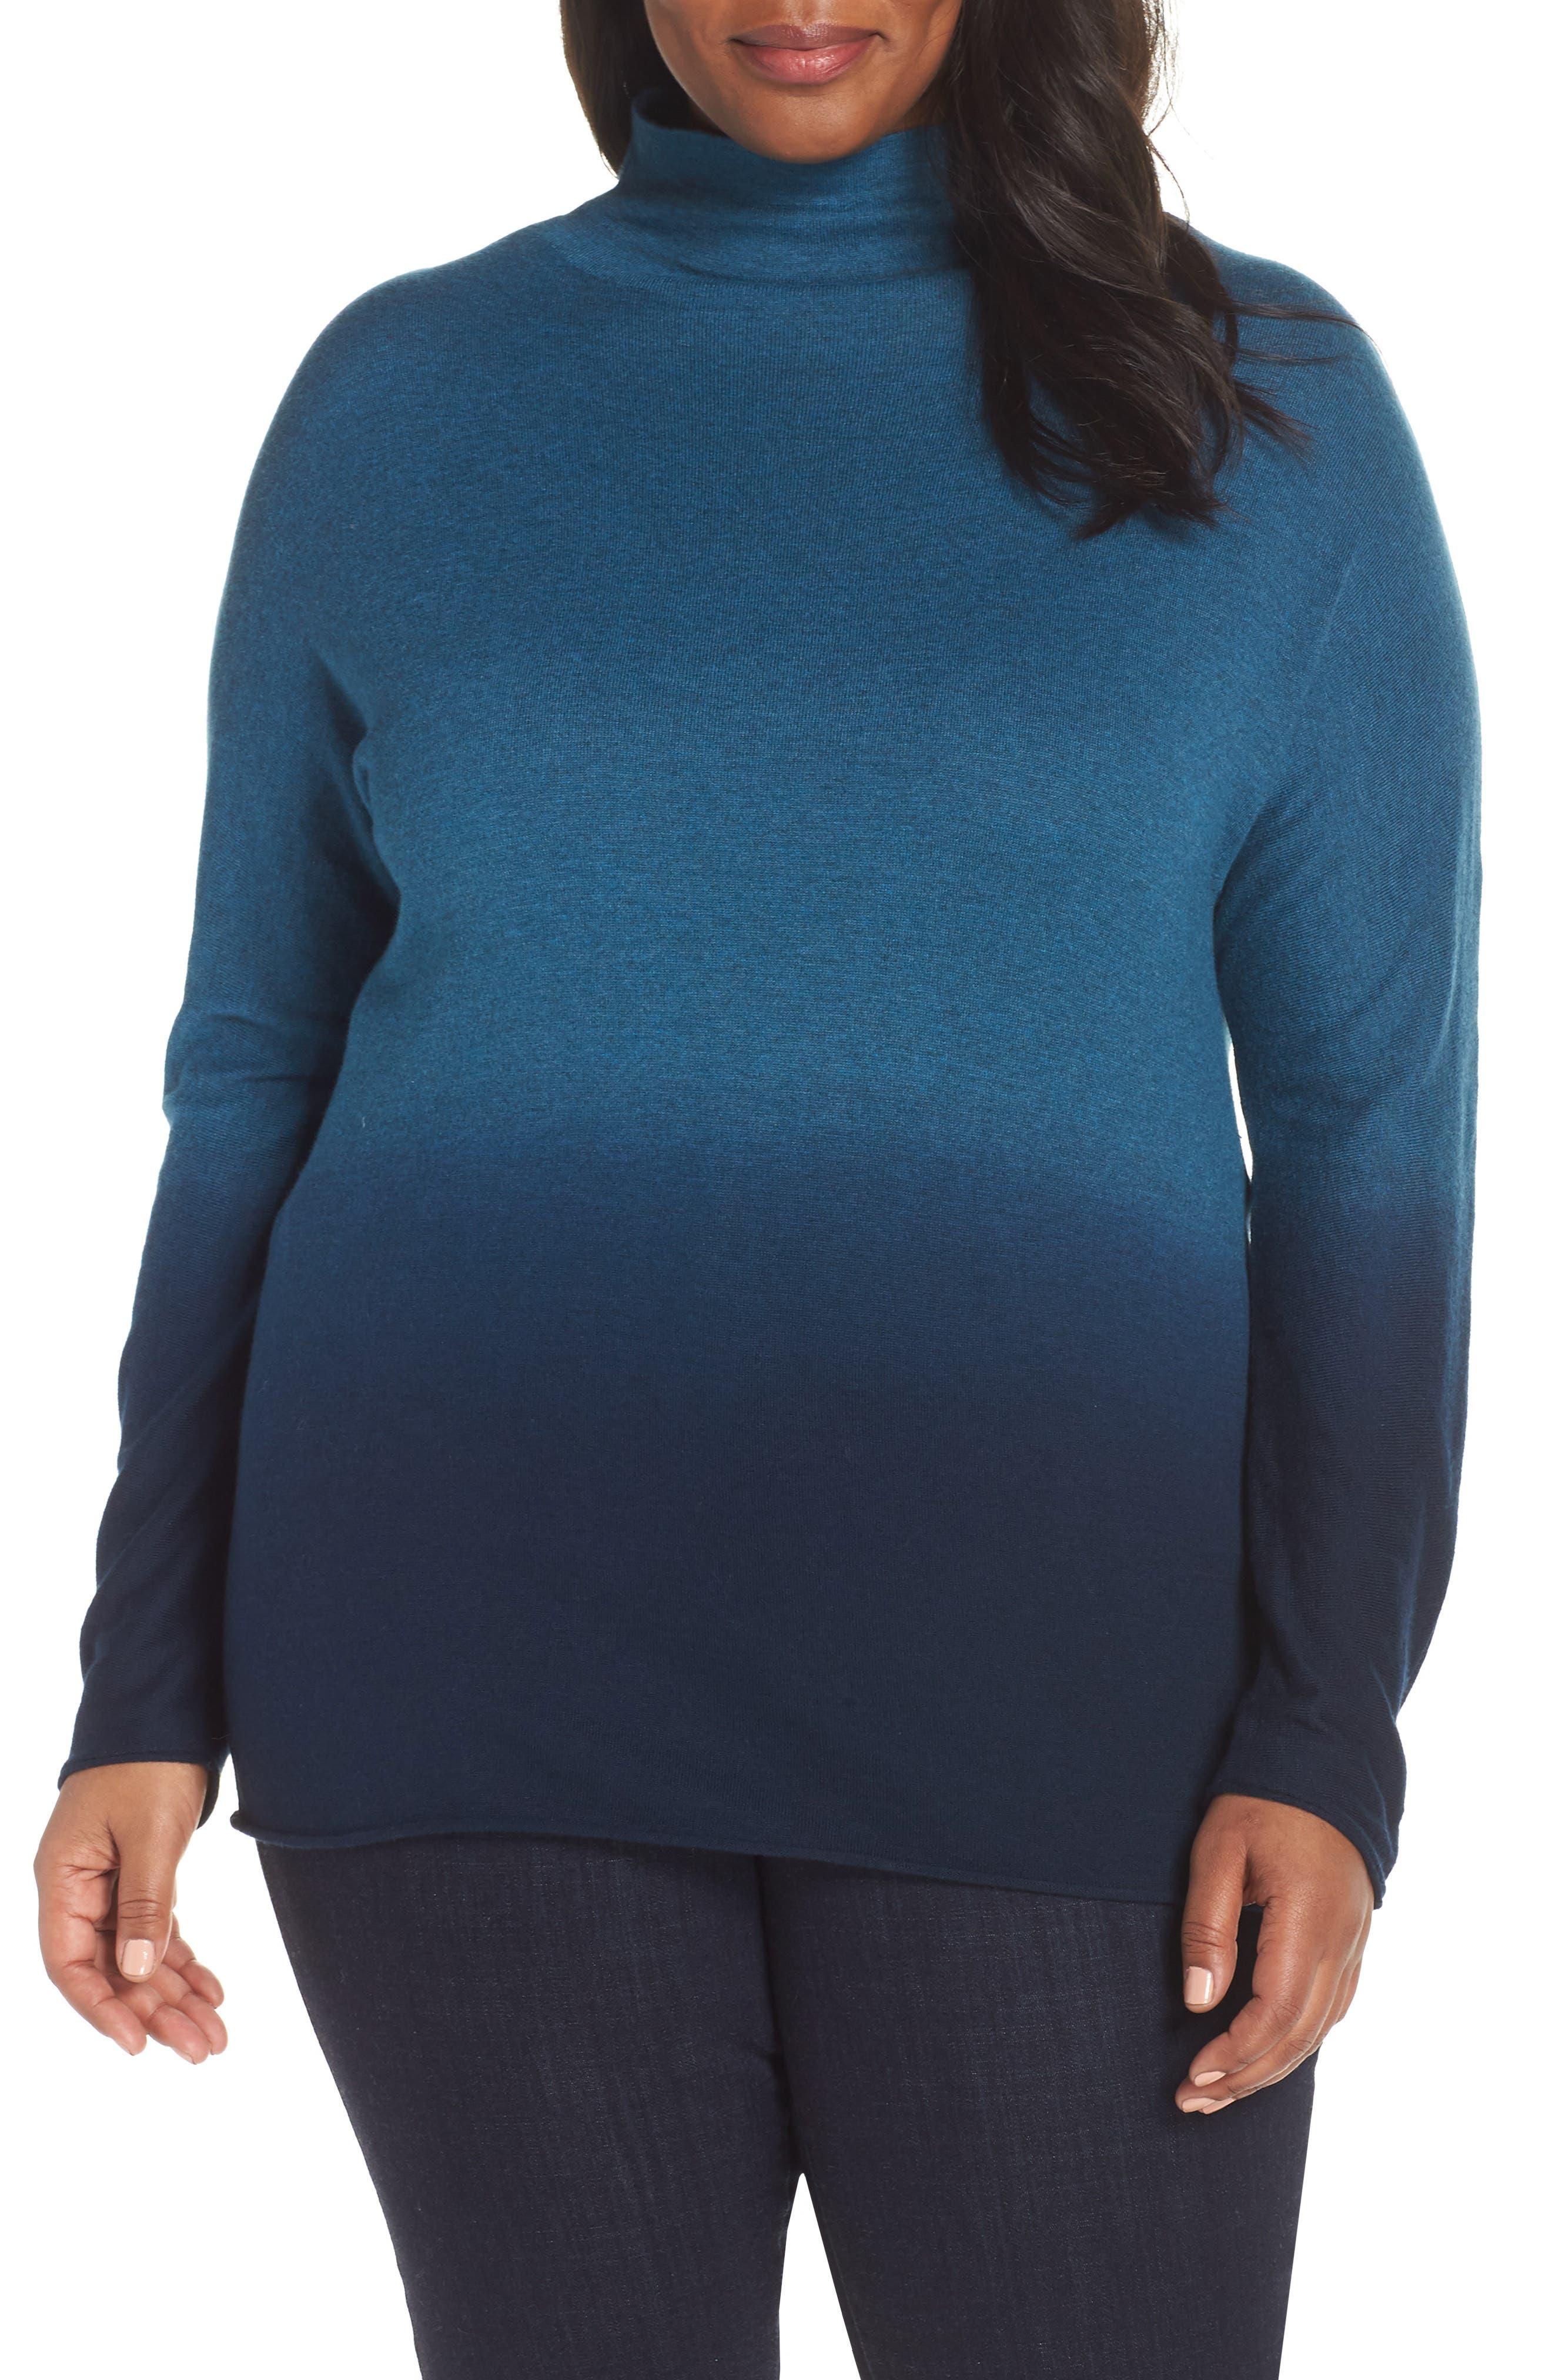 Traveler Funnel Neck Sweater in Beryl